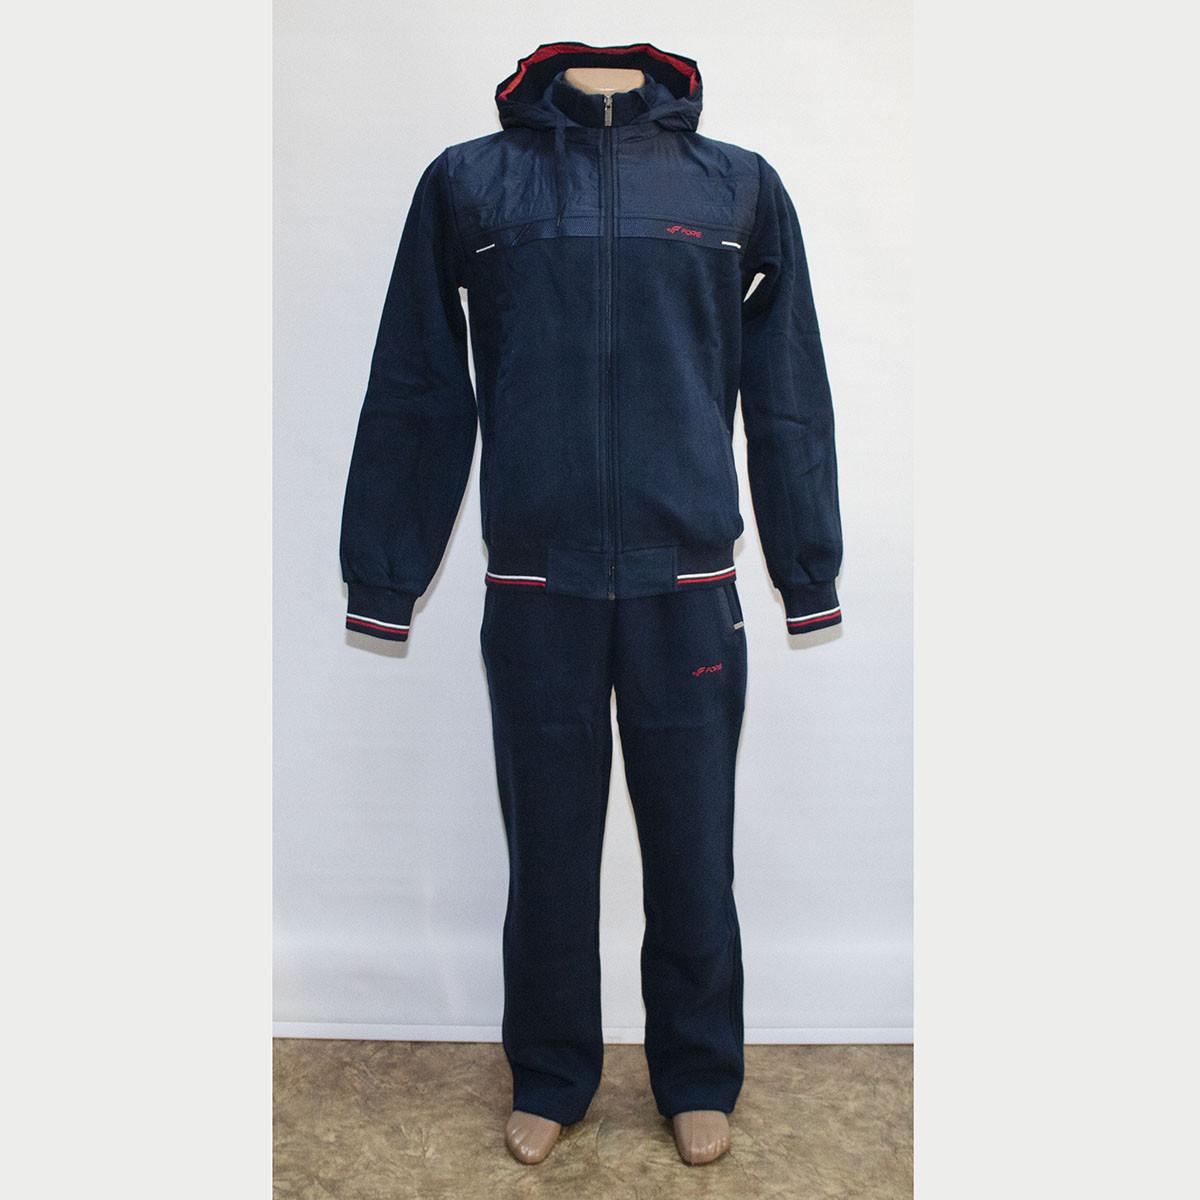 d0fd8ceb5ea6 Теплый мужской спортивный костюм трехнитка т.м. Fore 5289 оптом и в  розницу, ...